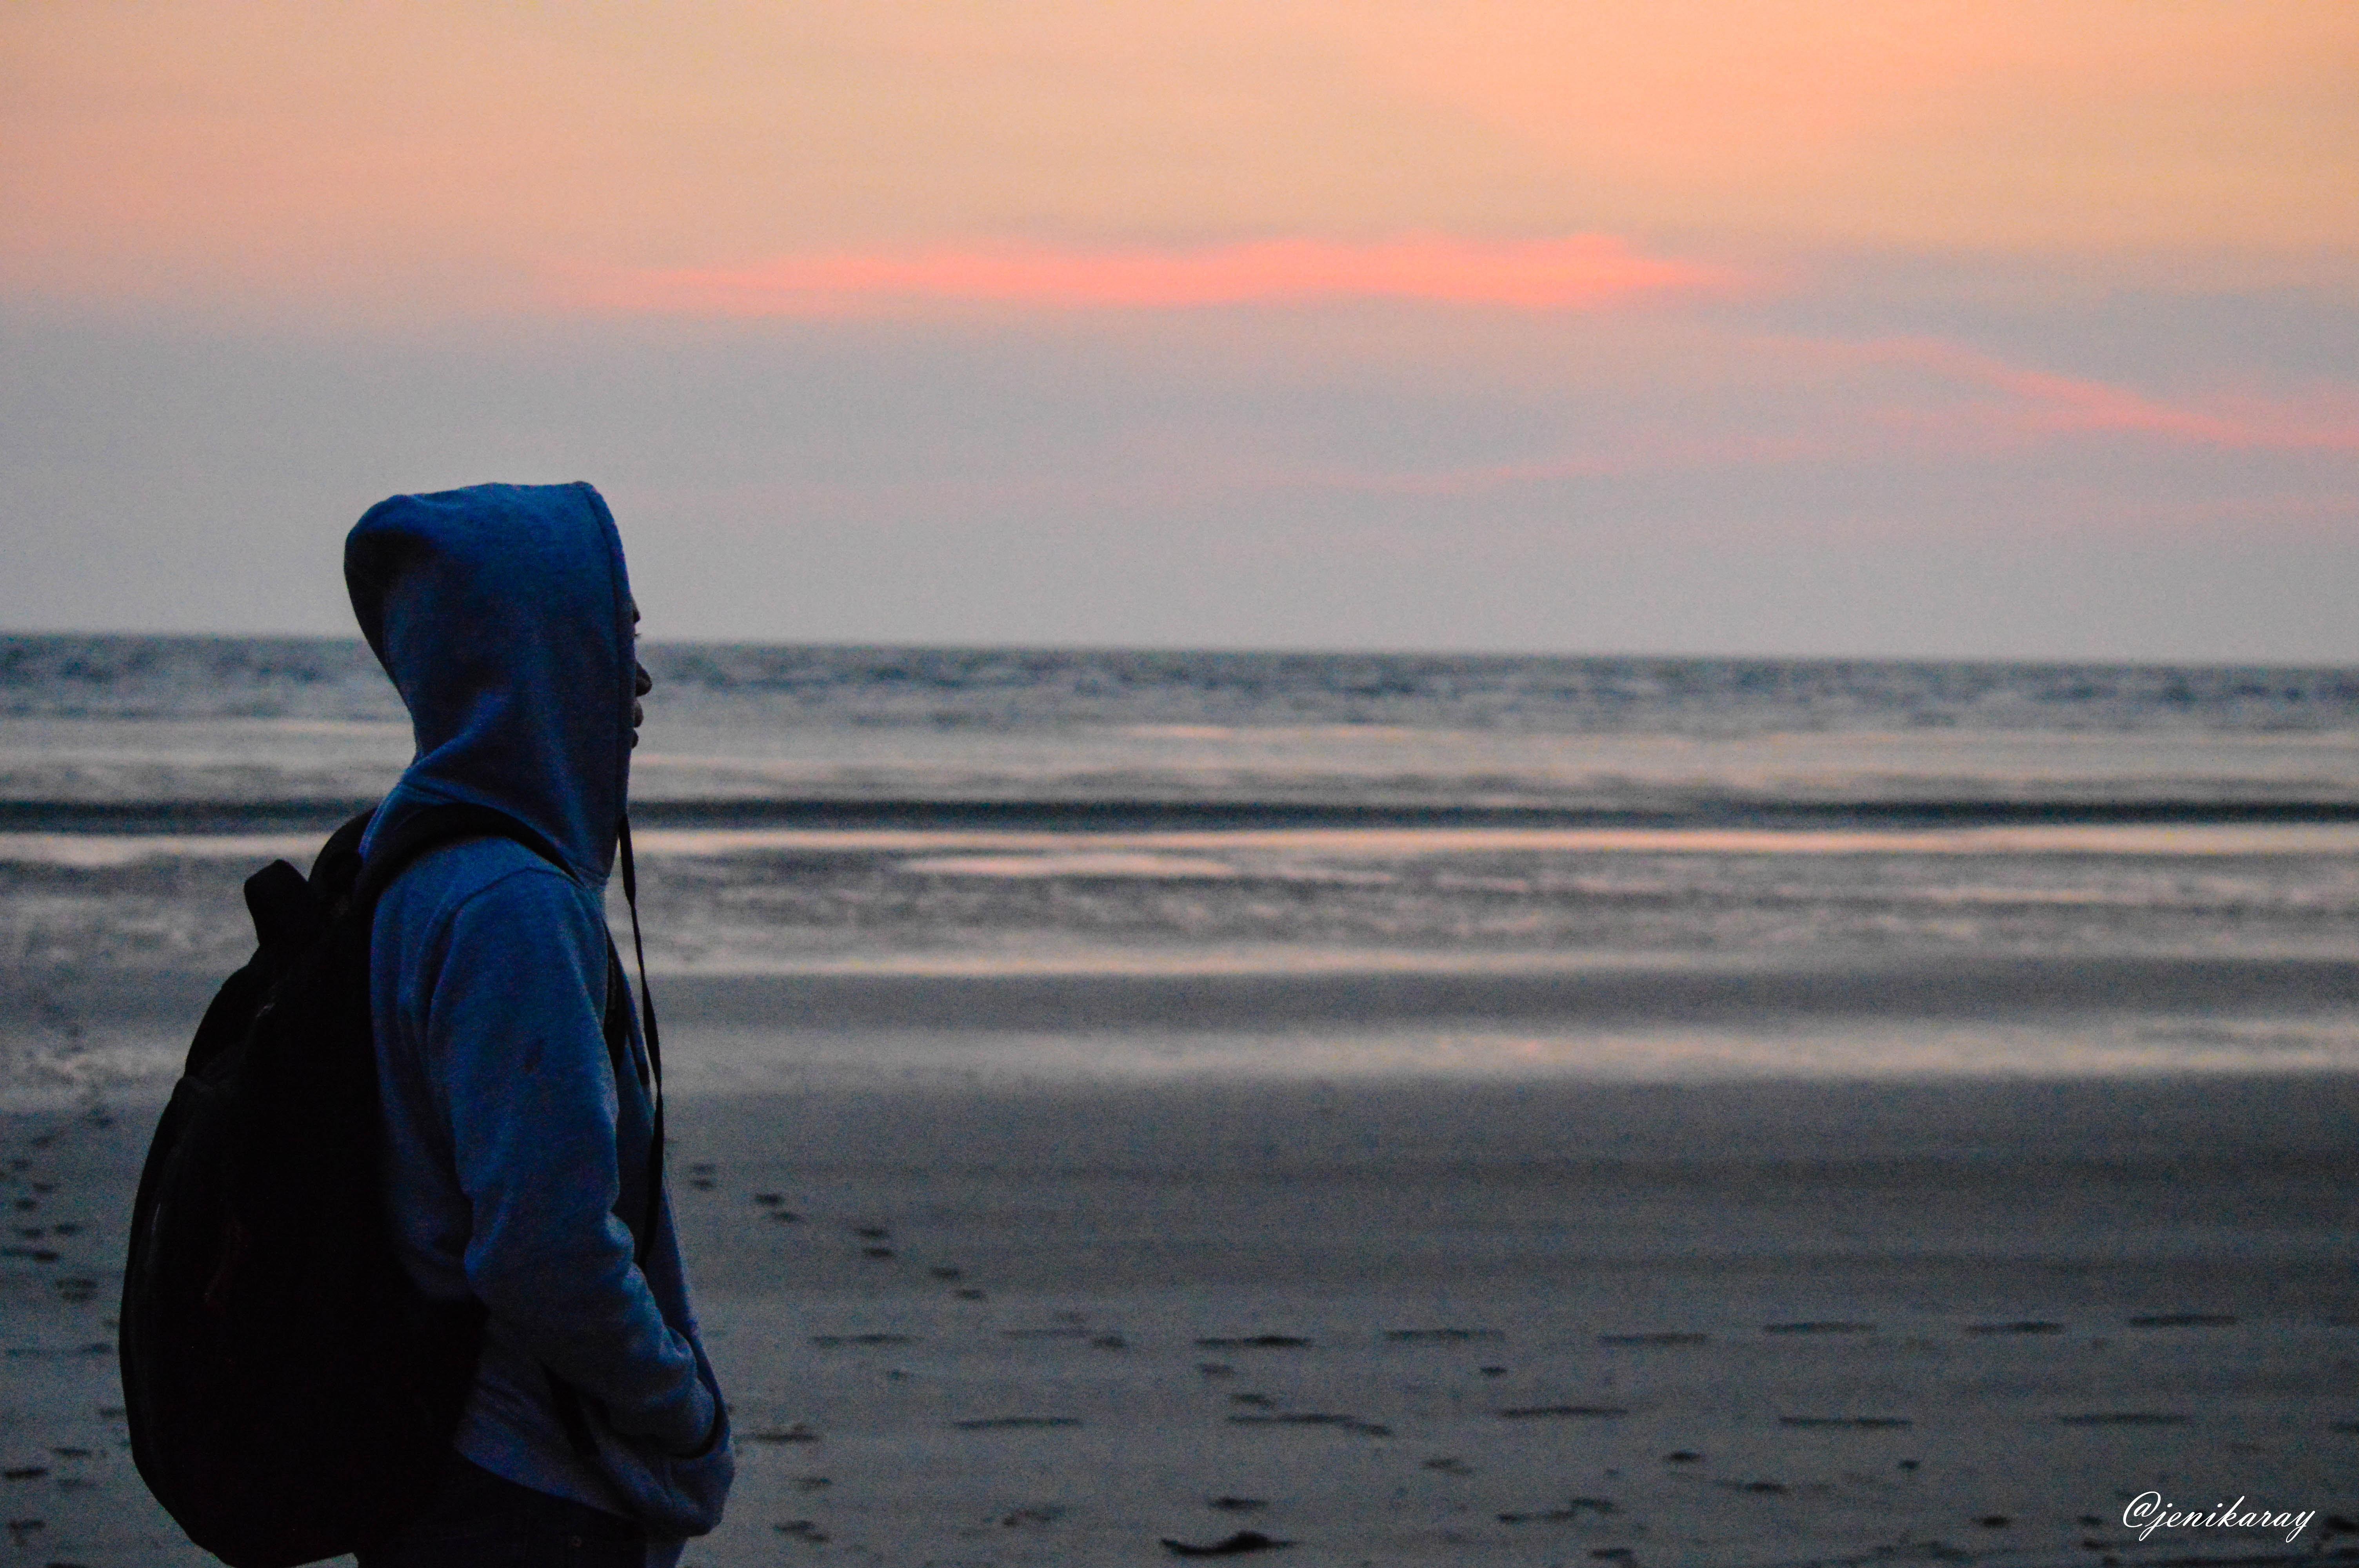 Sunset at Merauke City, Captured by Jeni Karay